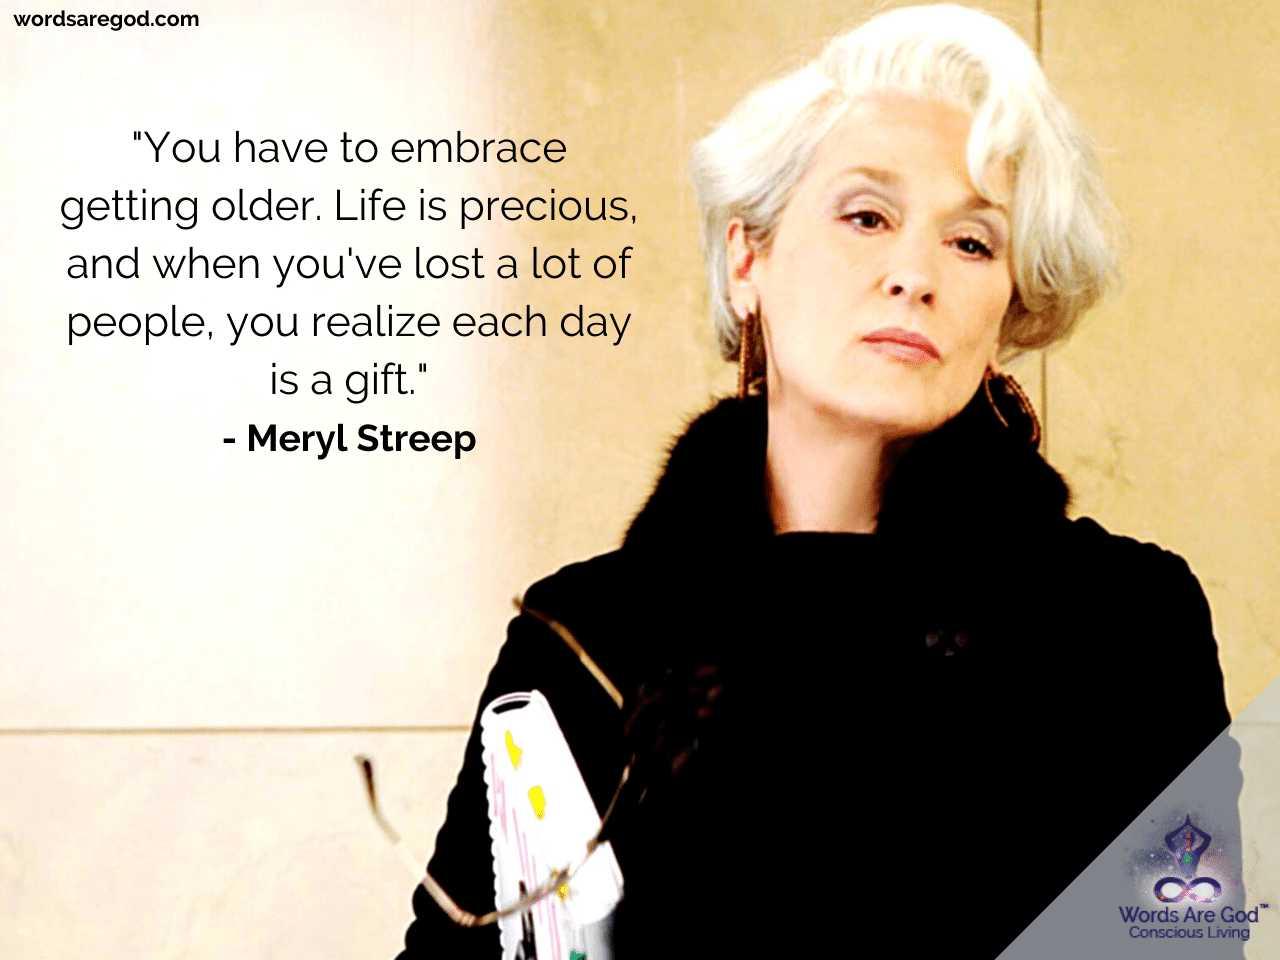 Meryl streep Life Quotes by Meryl Streep